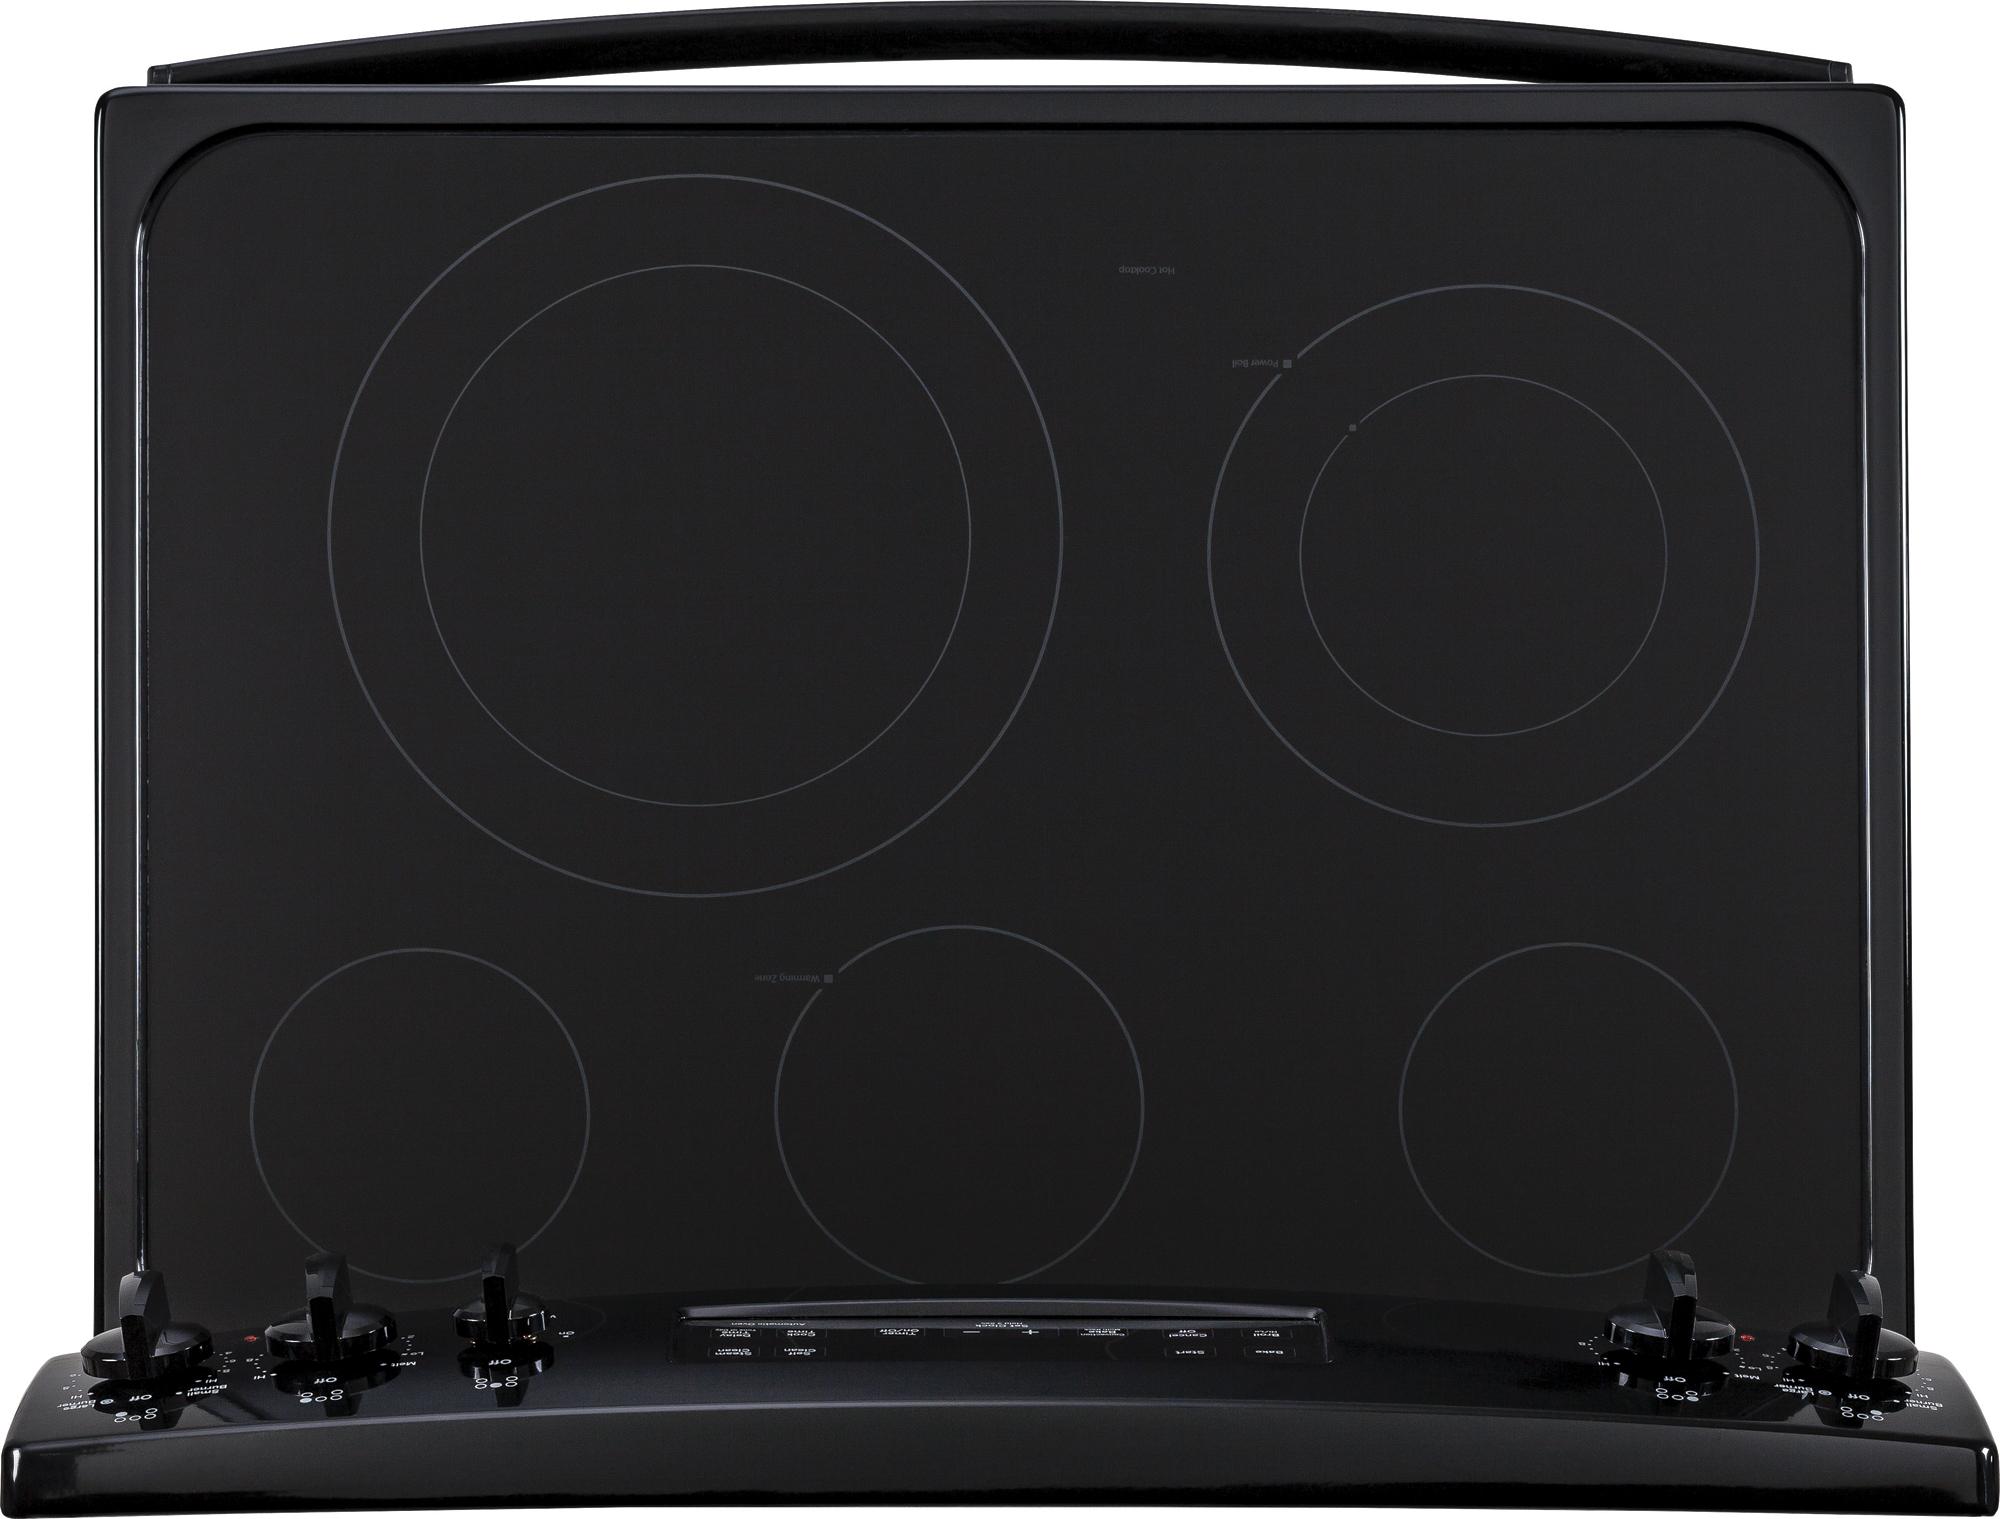 GE Appliances JB650DFBB 5.3 cu. ft. Electric Range - Black